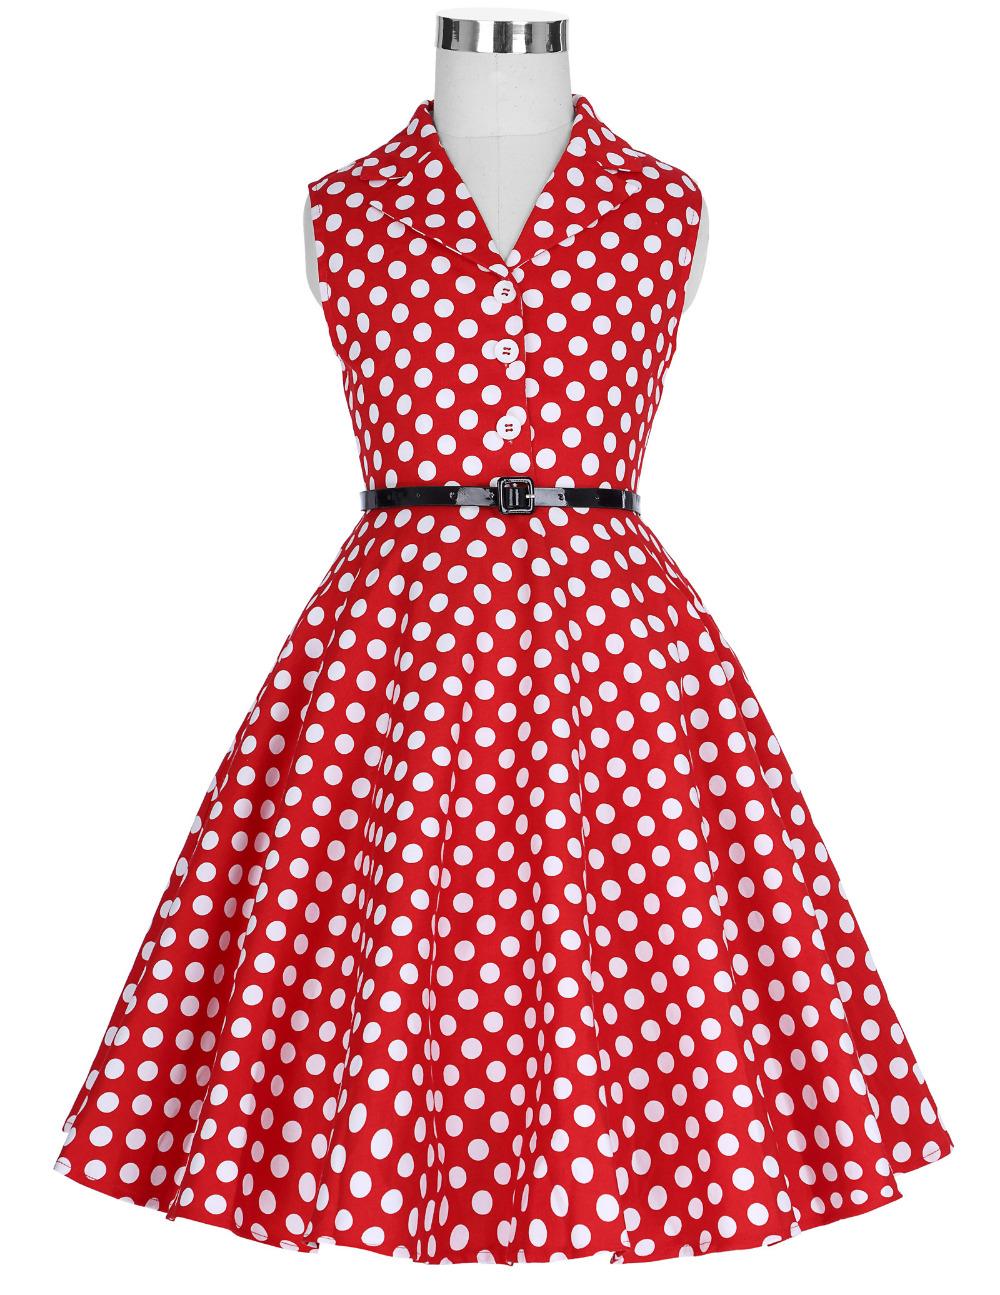 Grace Karin Flower Girl Dresses for Weddings 2017 Sleeveless Polka Dots Printed Vintage Pin Up Style Children's Clothing 15